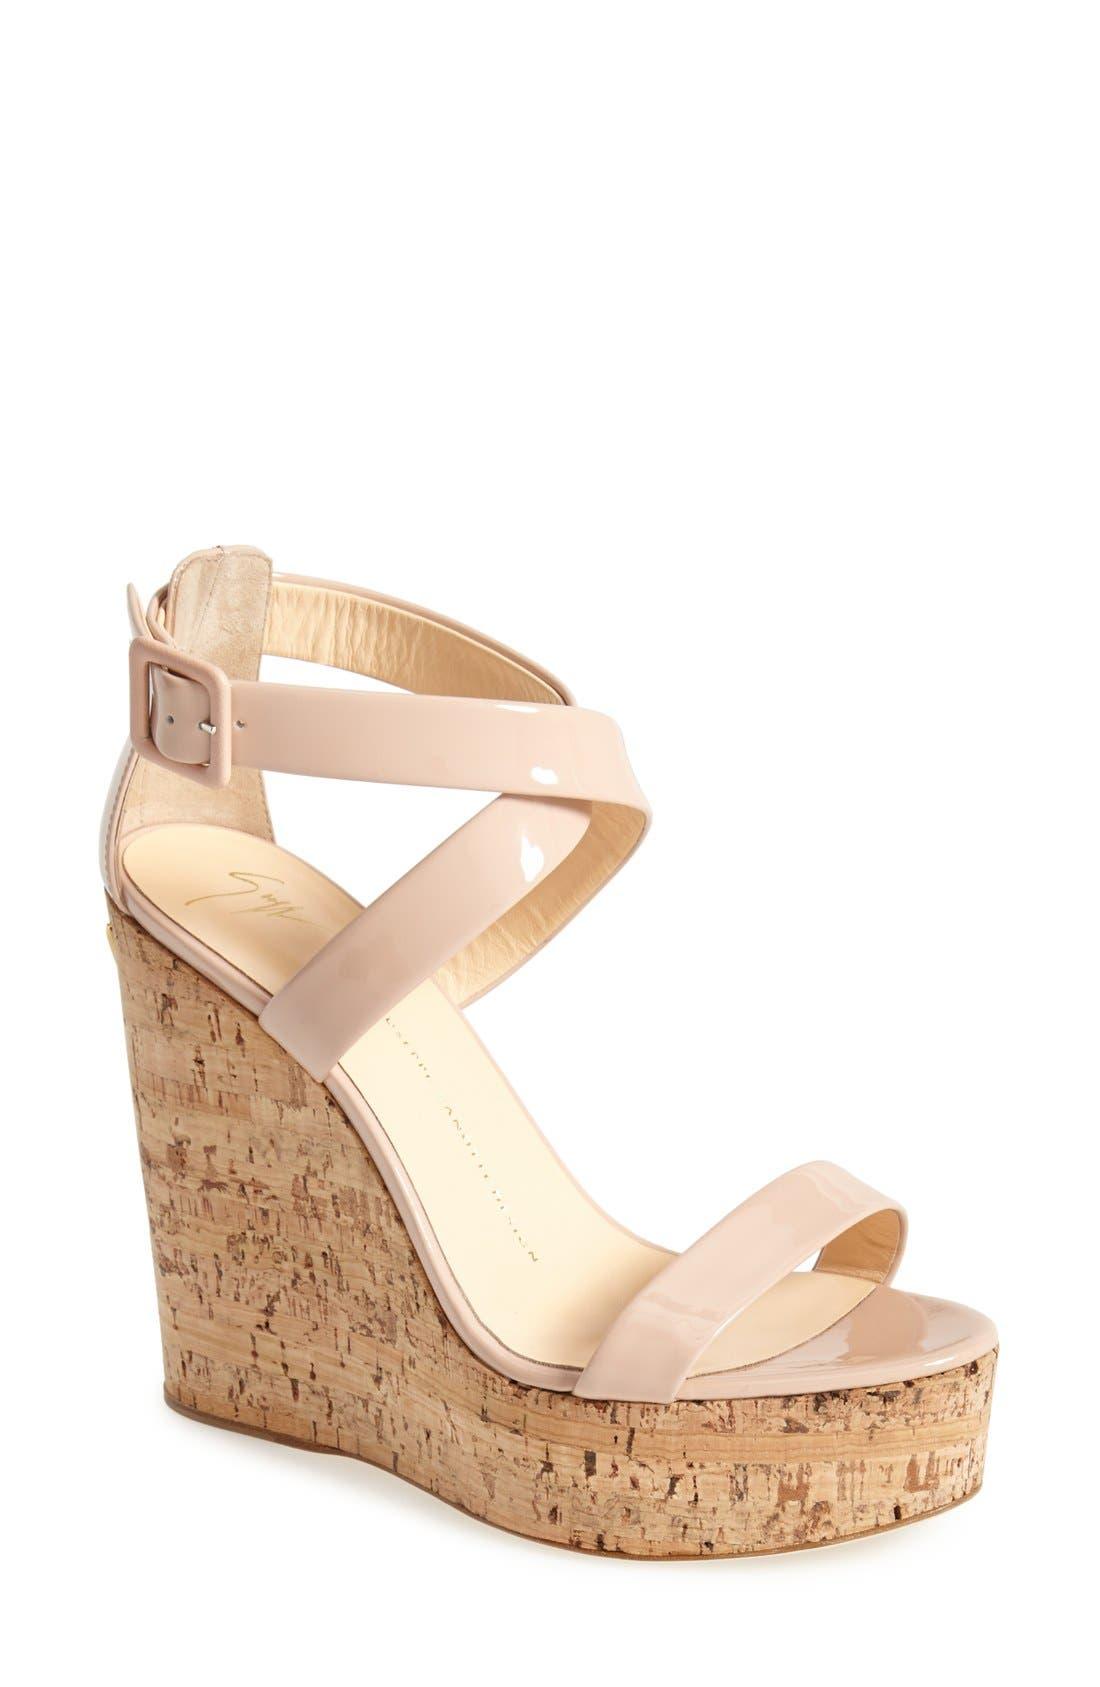 Alternate Image 1 Selected - Giuseppe Zanotti 'Roz' Platform Wedge Sandal (Women)